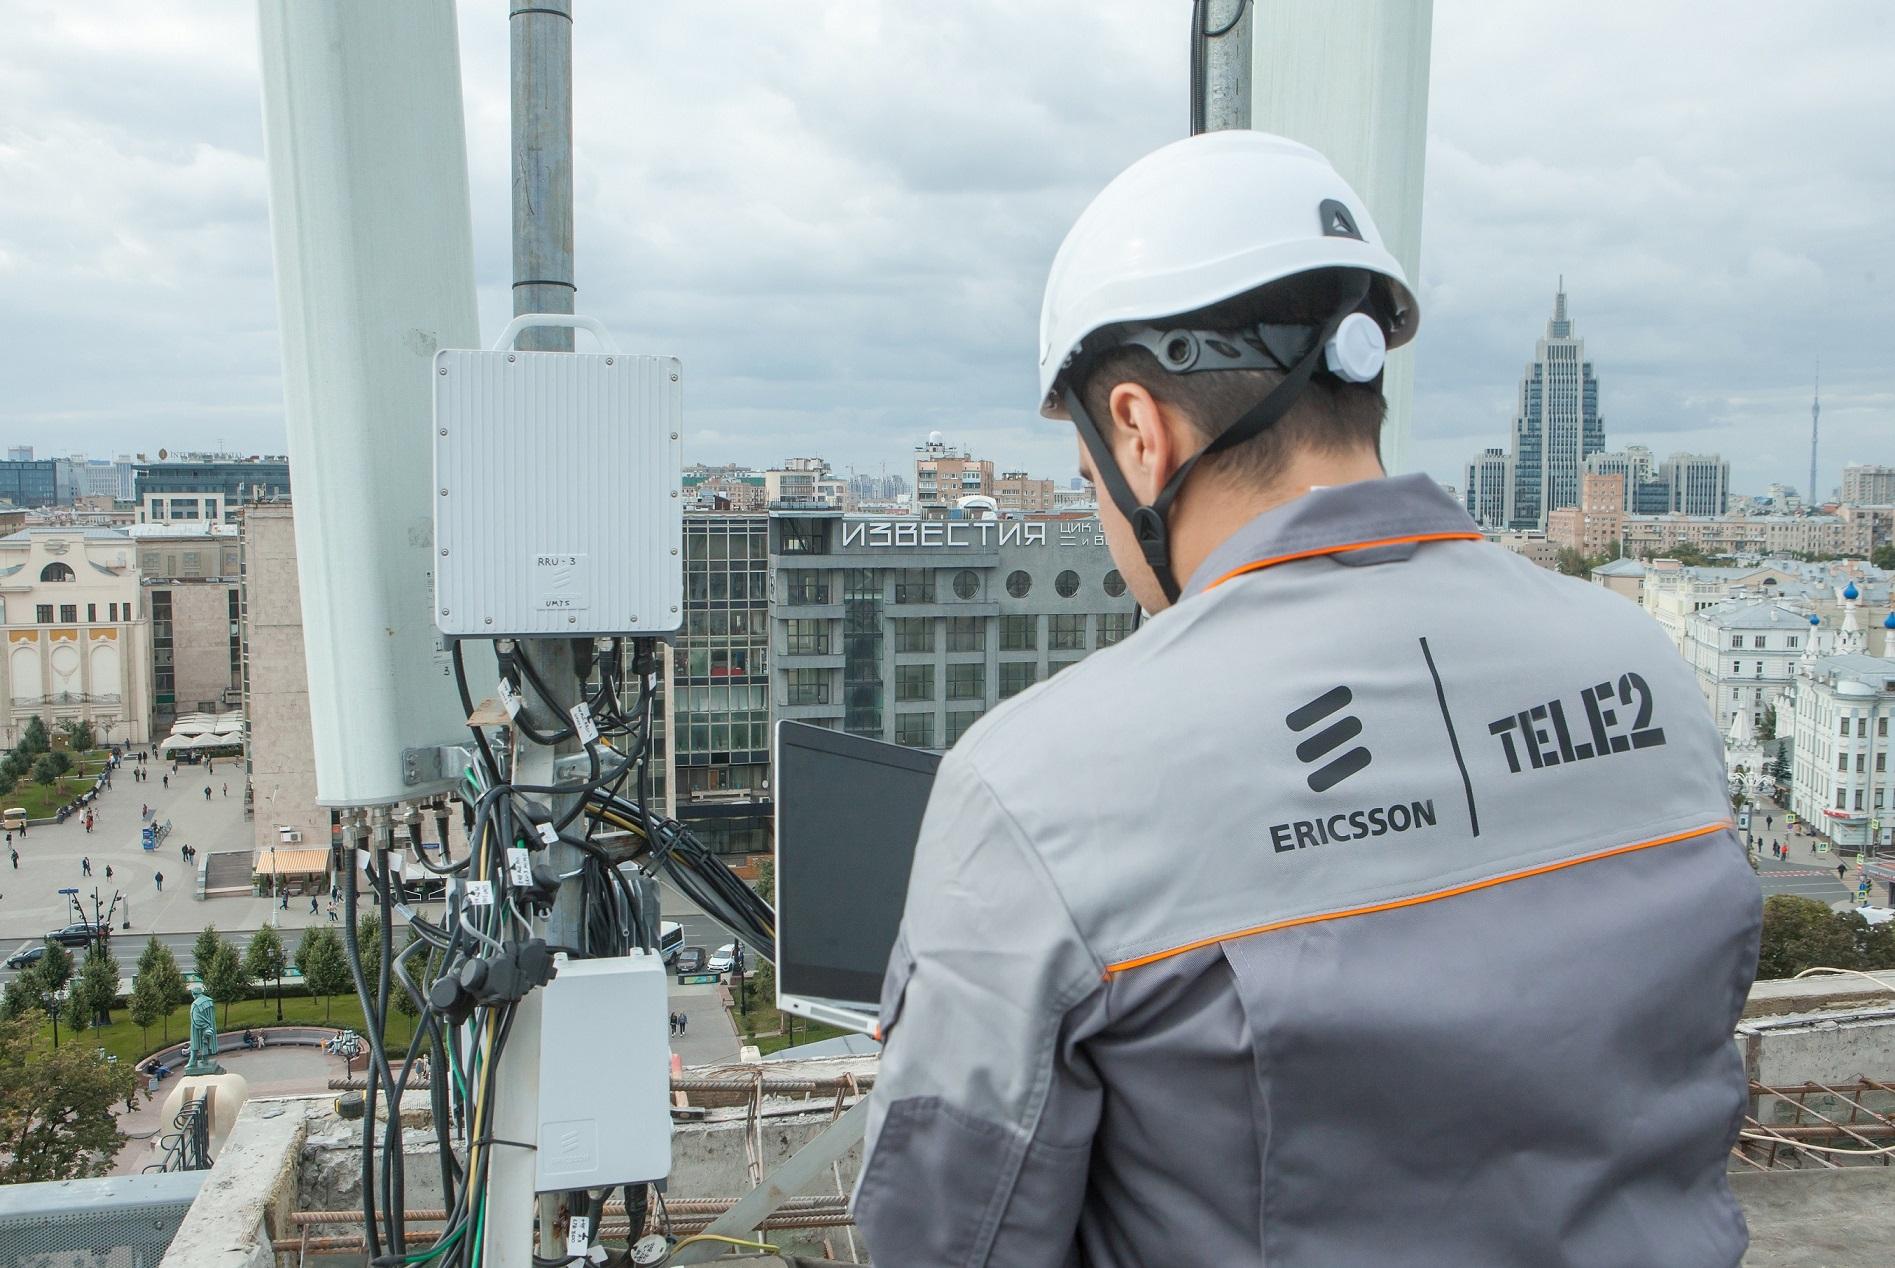 Tele2_Ericsson development_18.08.2020